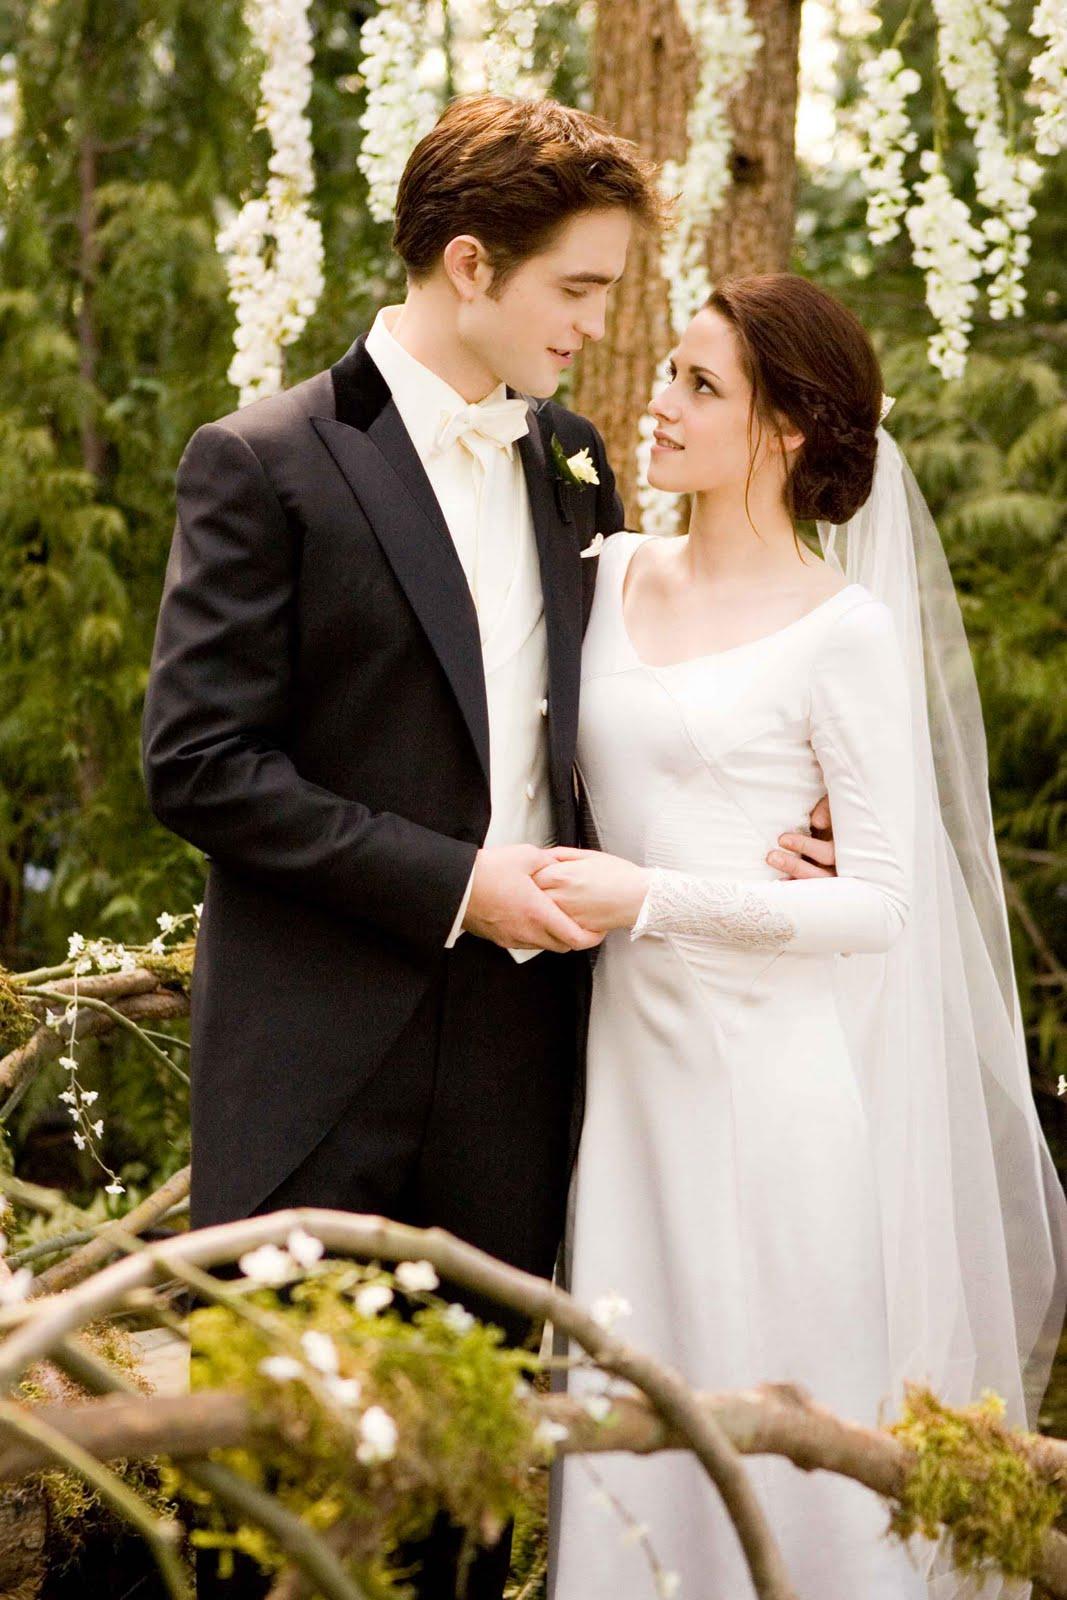 Twilight Breaking Dawn – Bella\'s Wedding Dress : Teaser Trailer